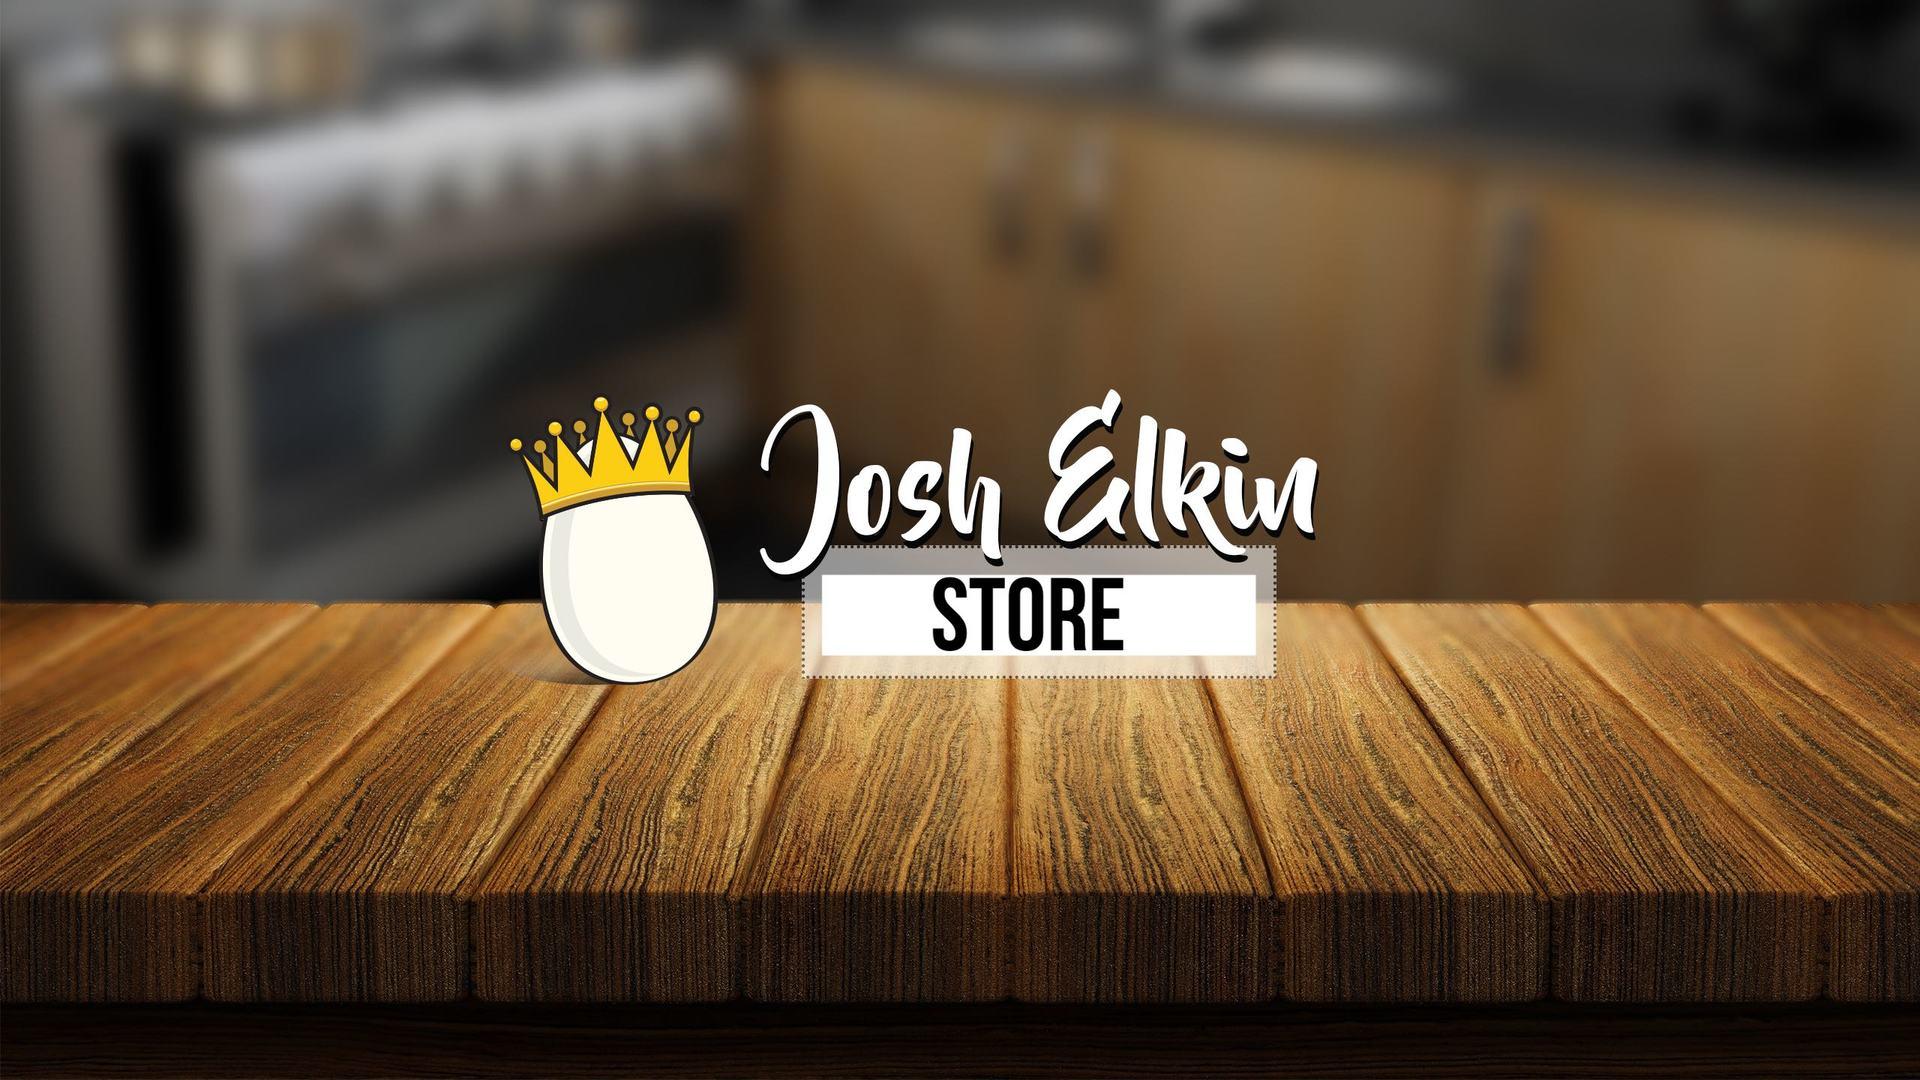 TheJoshElkin Store